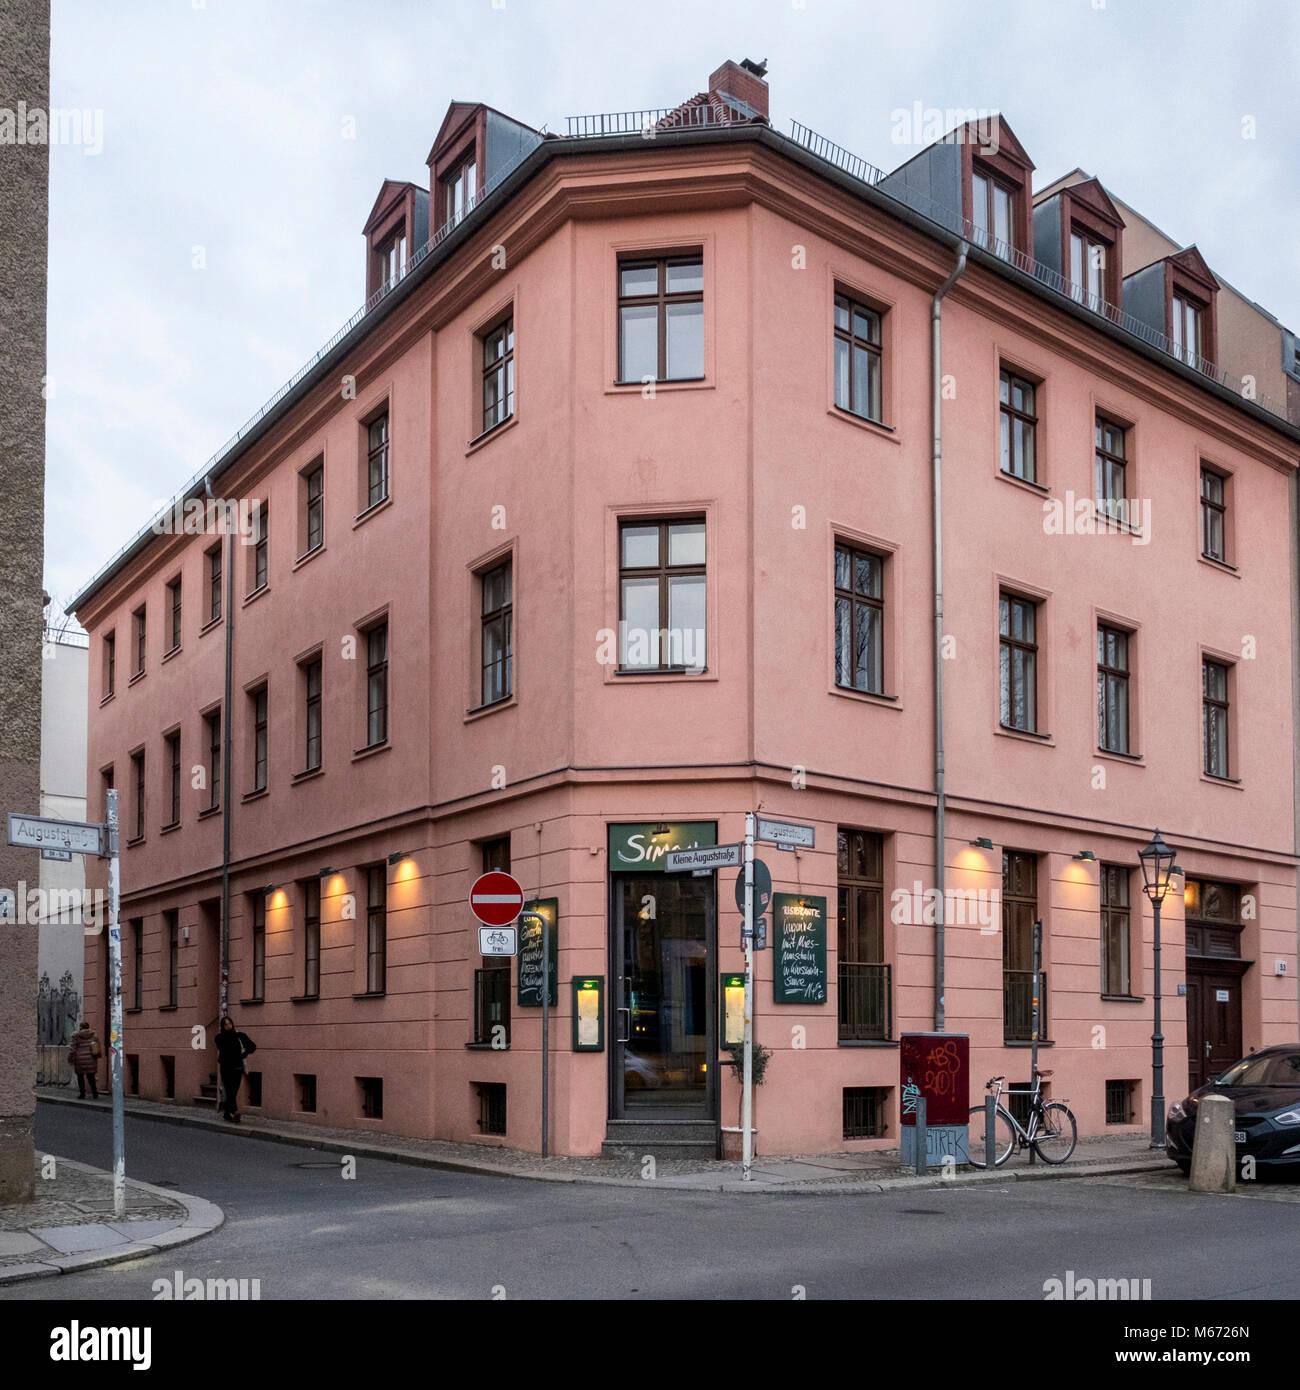 berlin, Mitte. Simon Italian restaurant on corner of August Strasse. Building exterior & entrance - Stock Image